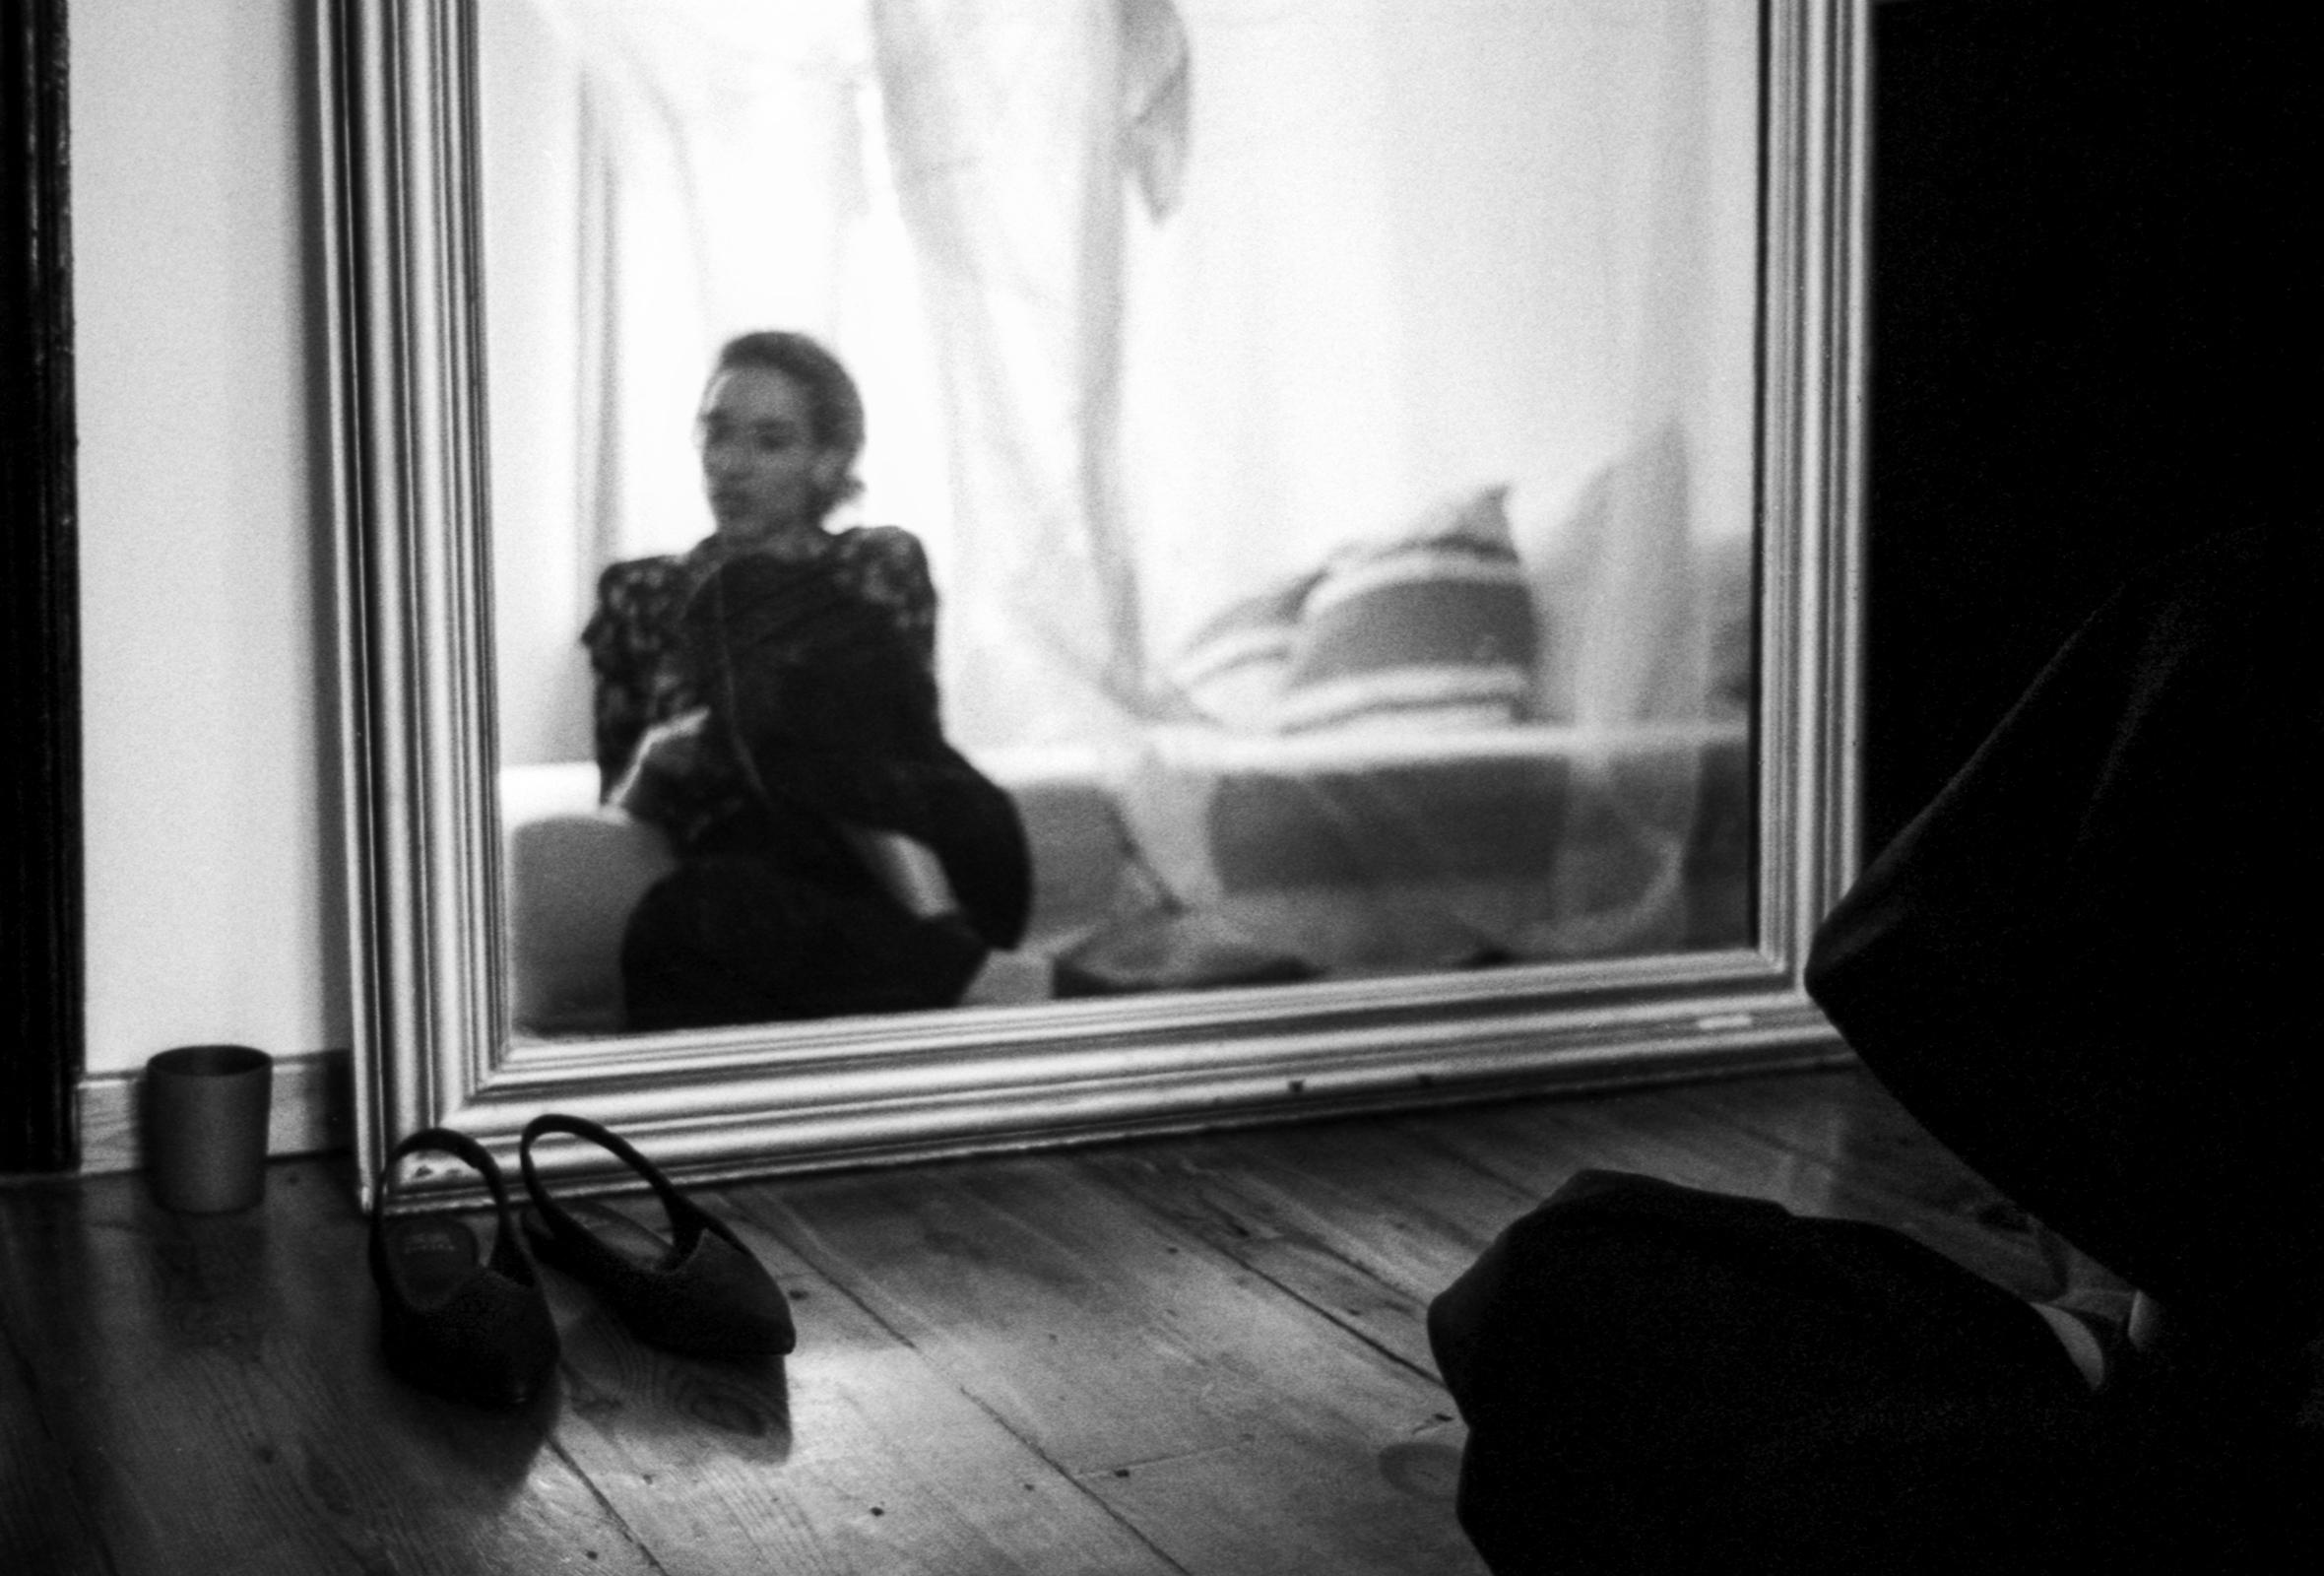 Natalie Helsen by Hannah Frank Dusar